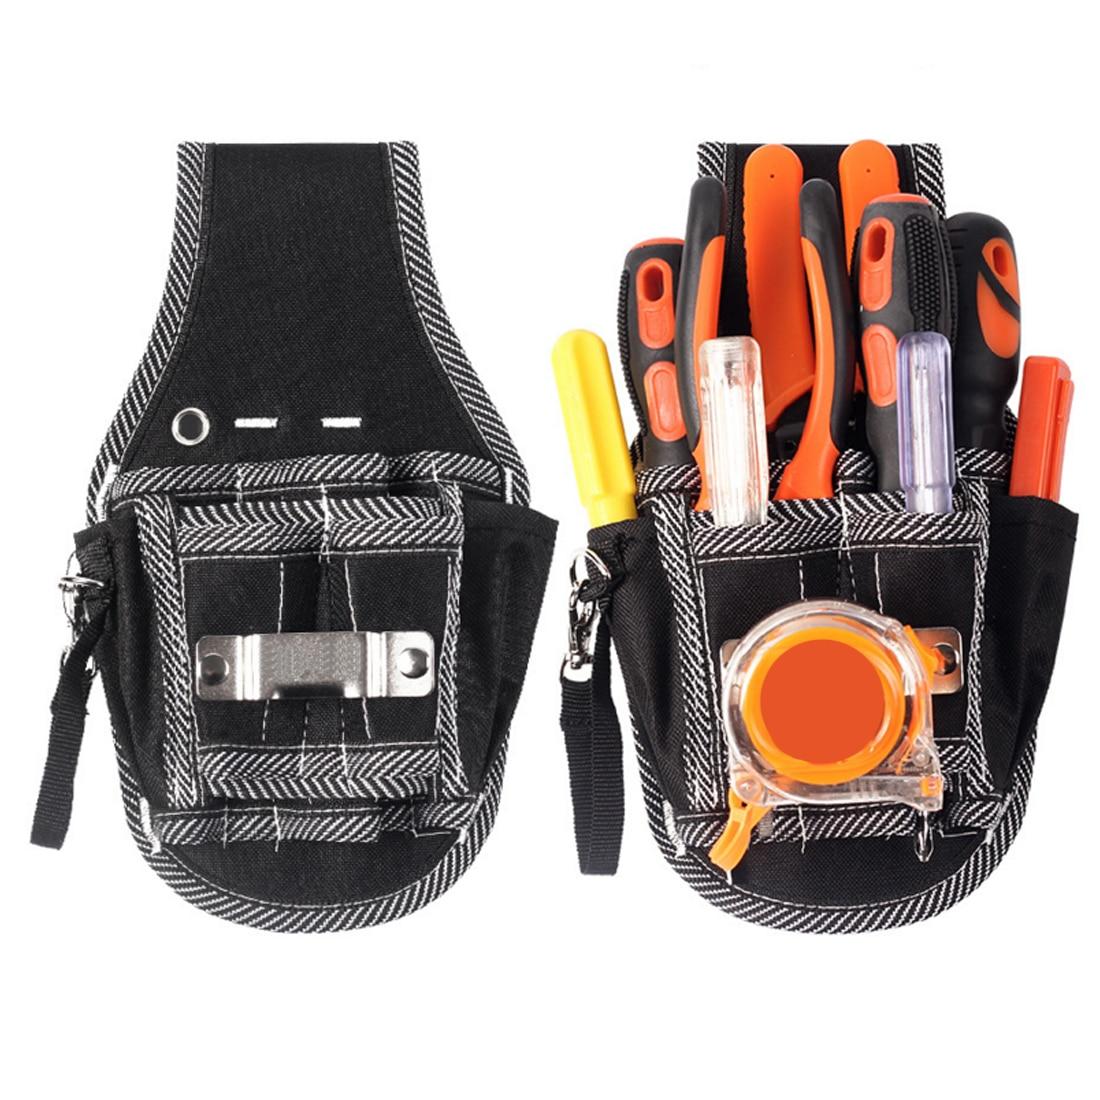 1pcs Screwdriver Pliers Organizer Holder Bag Tool Bag Nylon Pocket Electrician DIY Working Tool Pouch Bag Waist Belt